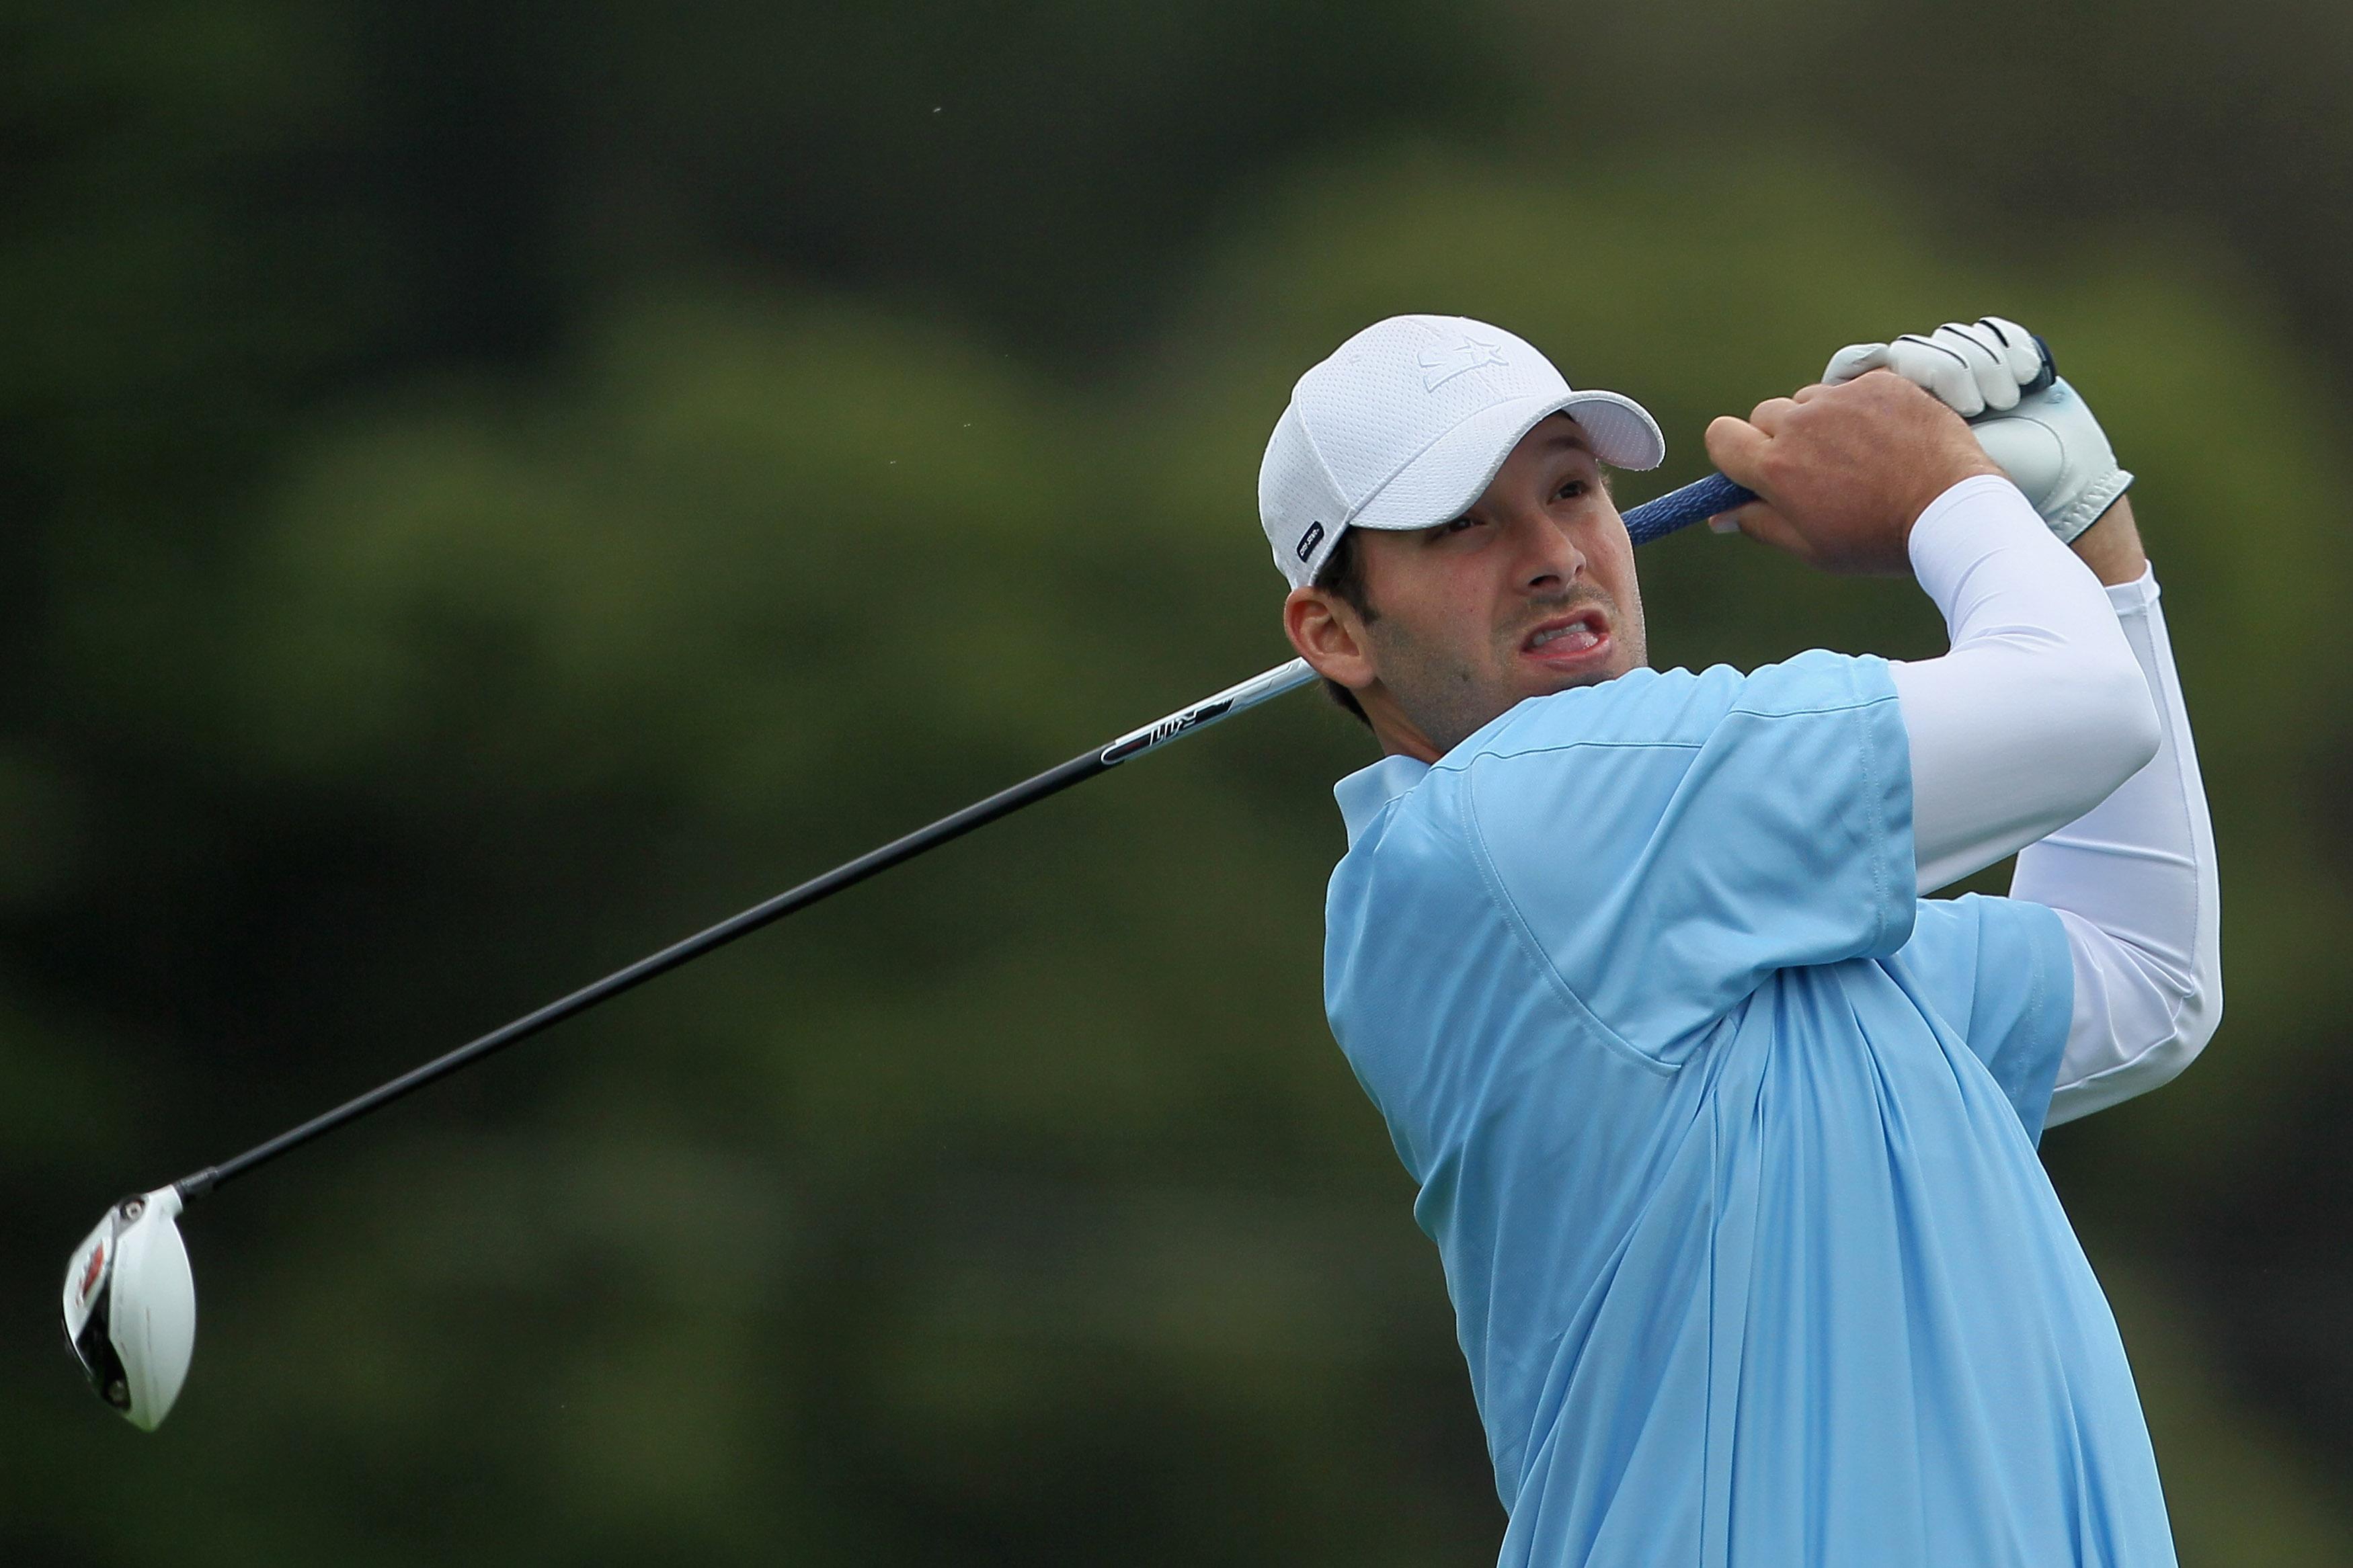 Tony Romo torneo Golf PGA regreso